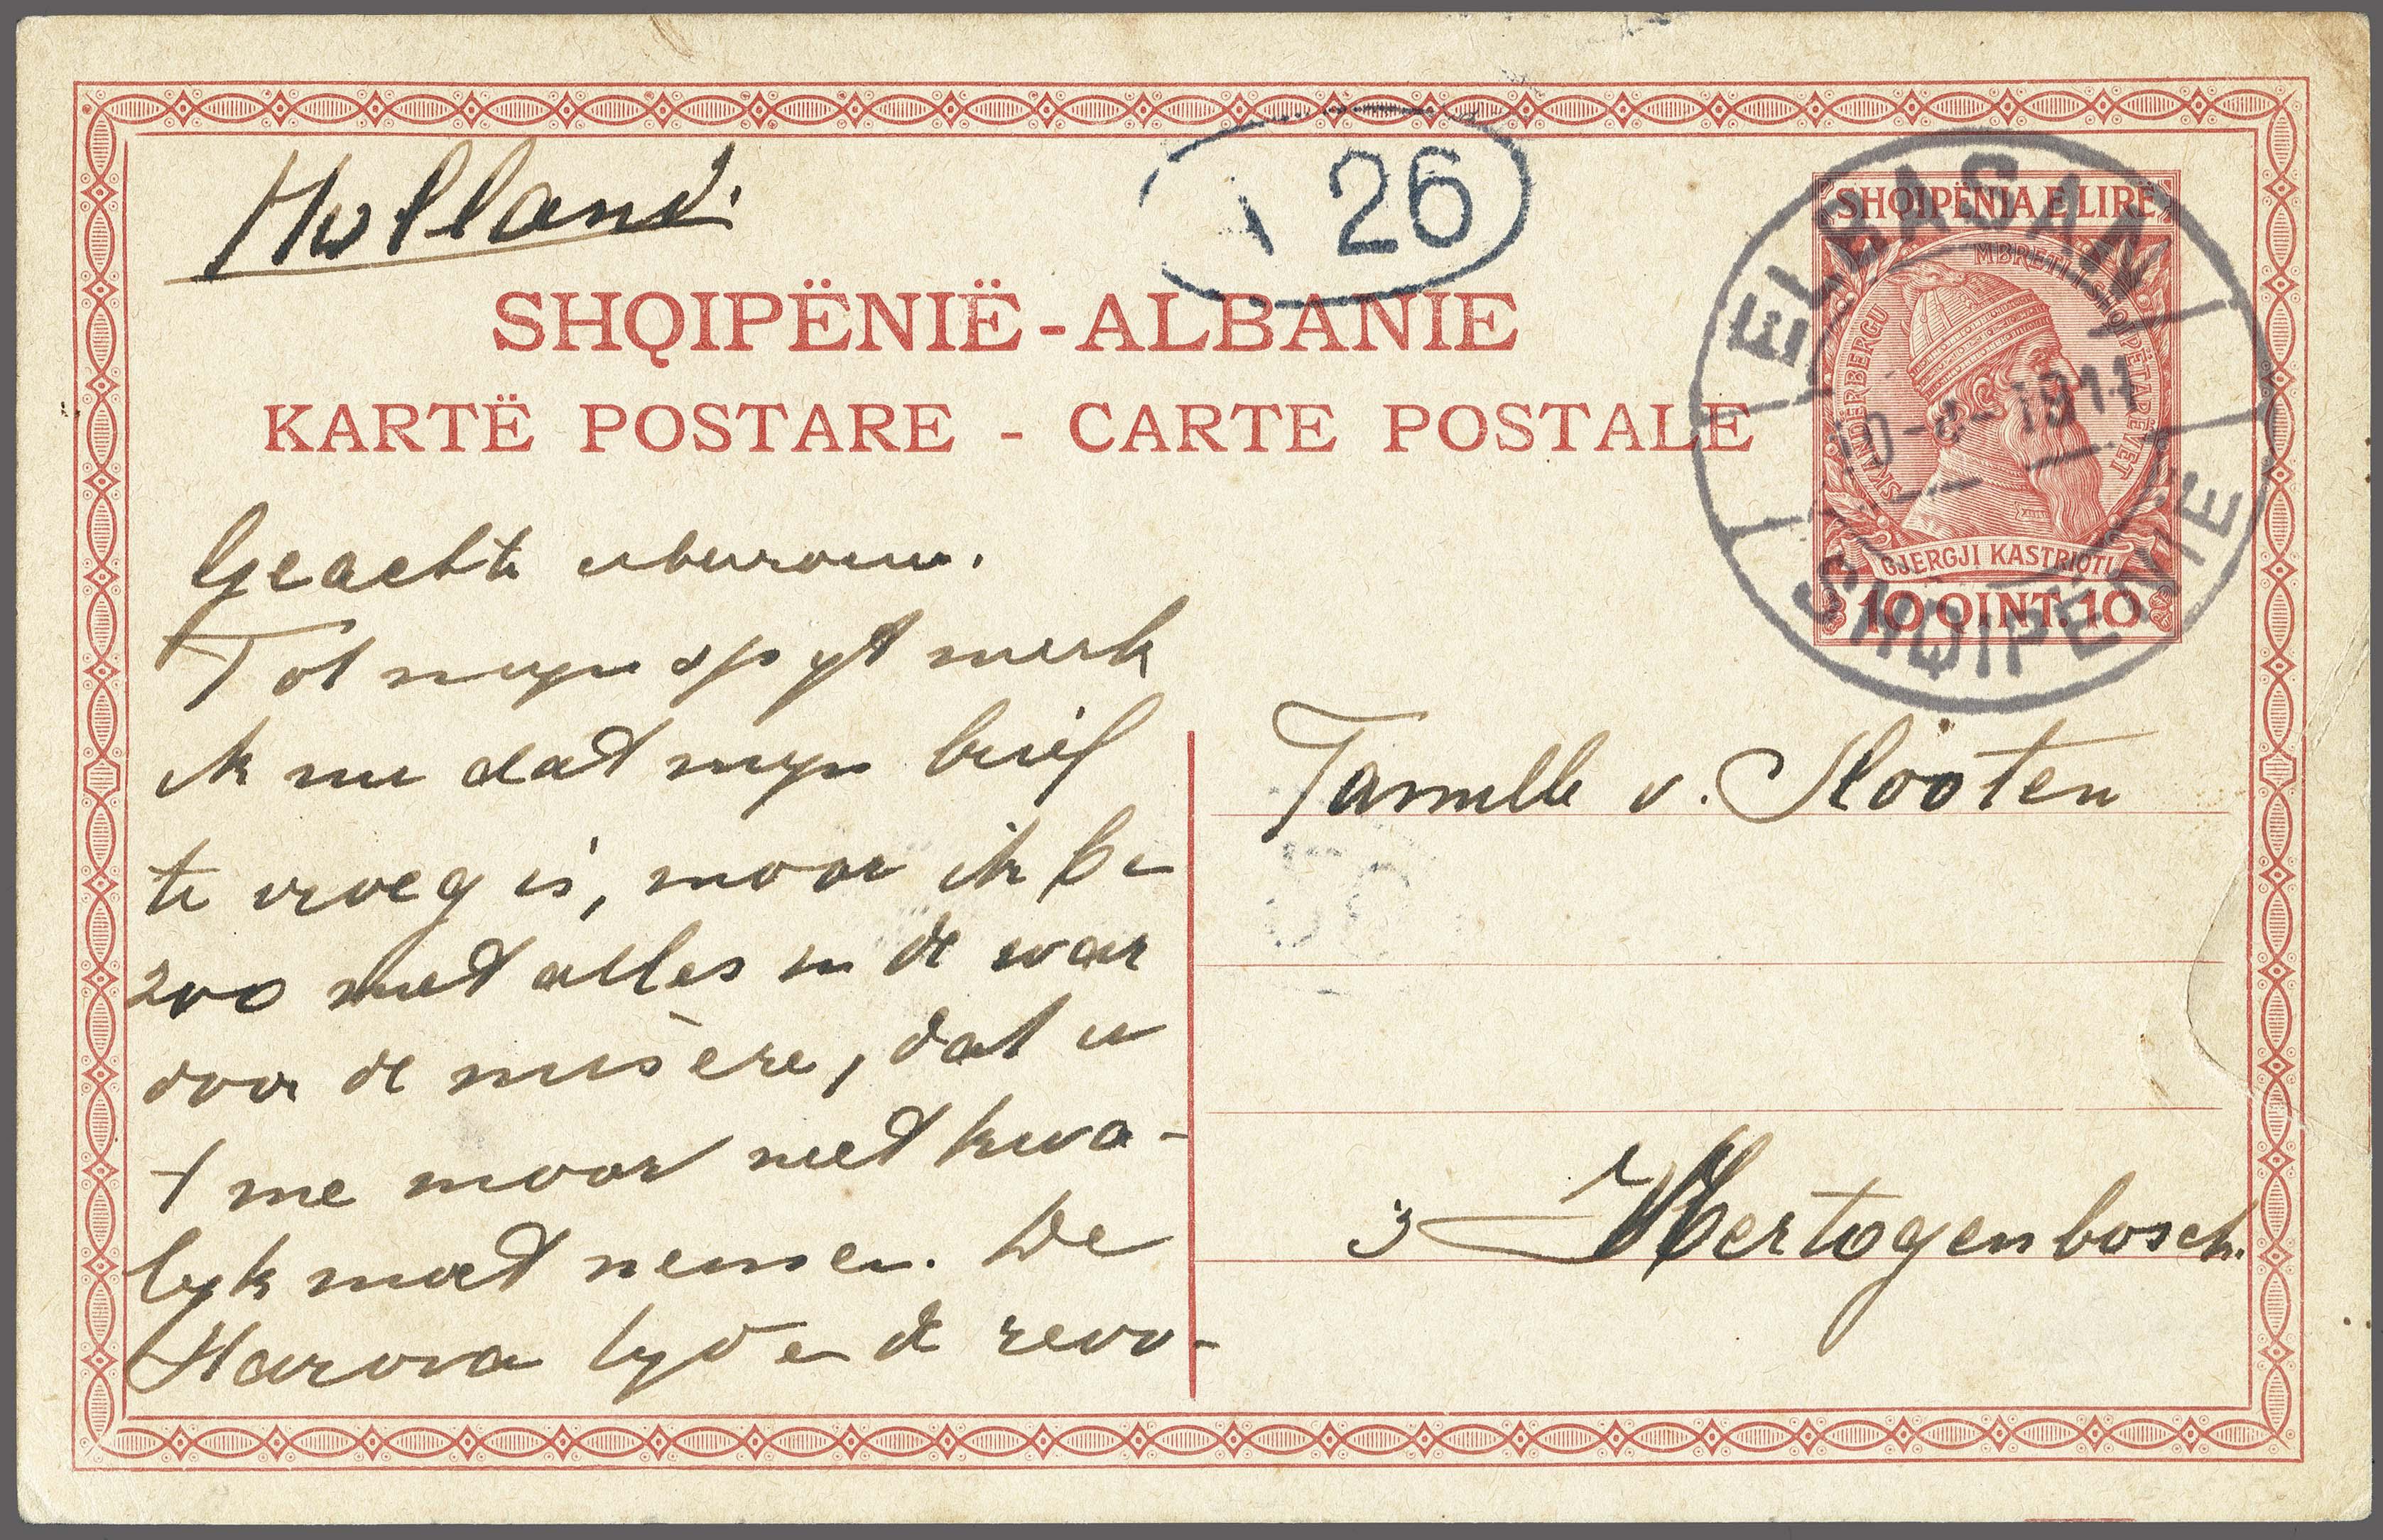 Lot 2 - European Countries Albania -  Corinphila Veilingen Auction 250-253 - Day 1 - Foreign countries